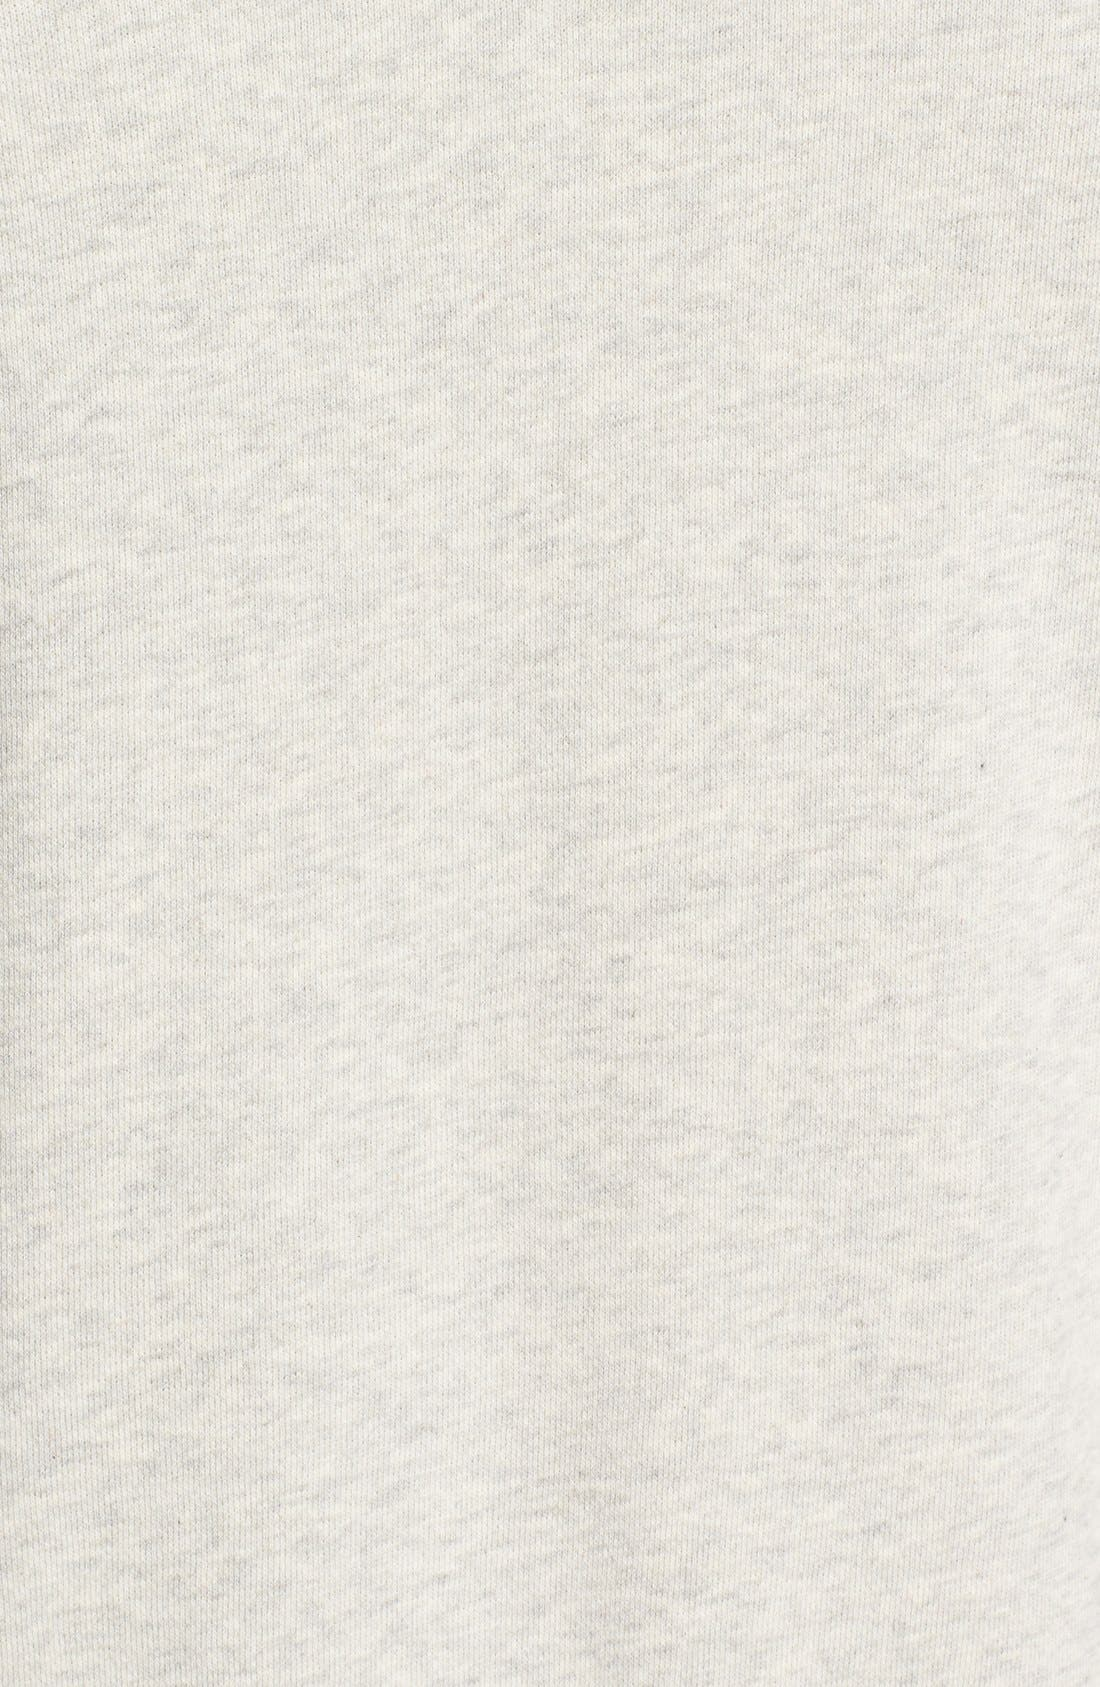 Bay Meadows Sweatshirt,                             Alternate thumbnail 5, color,                             White